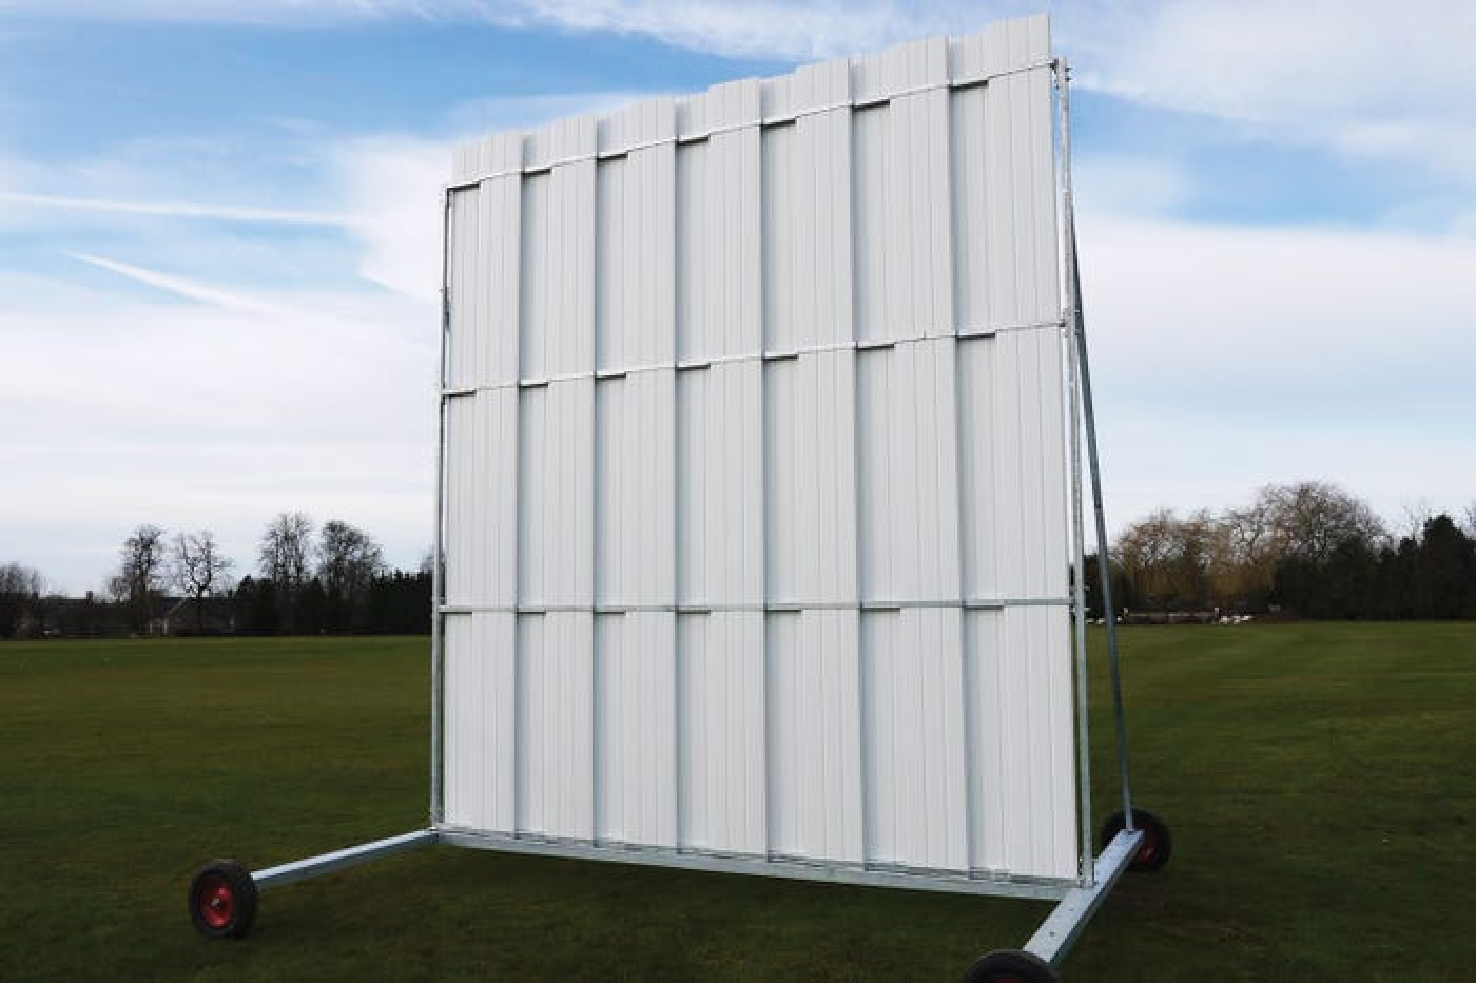 Stadia Elite' Polypropylene Cricket Sight Screens - 4.5m High x 5m Wide